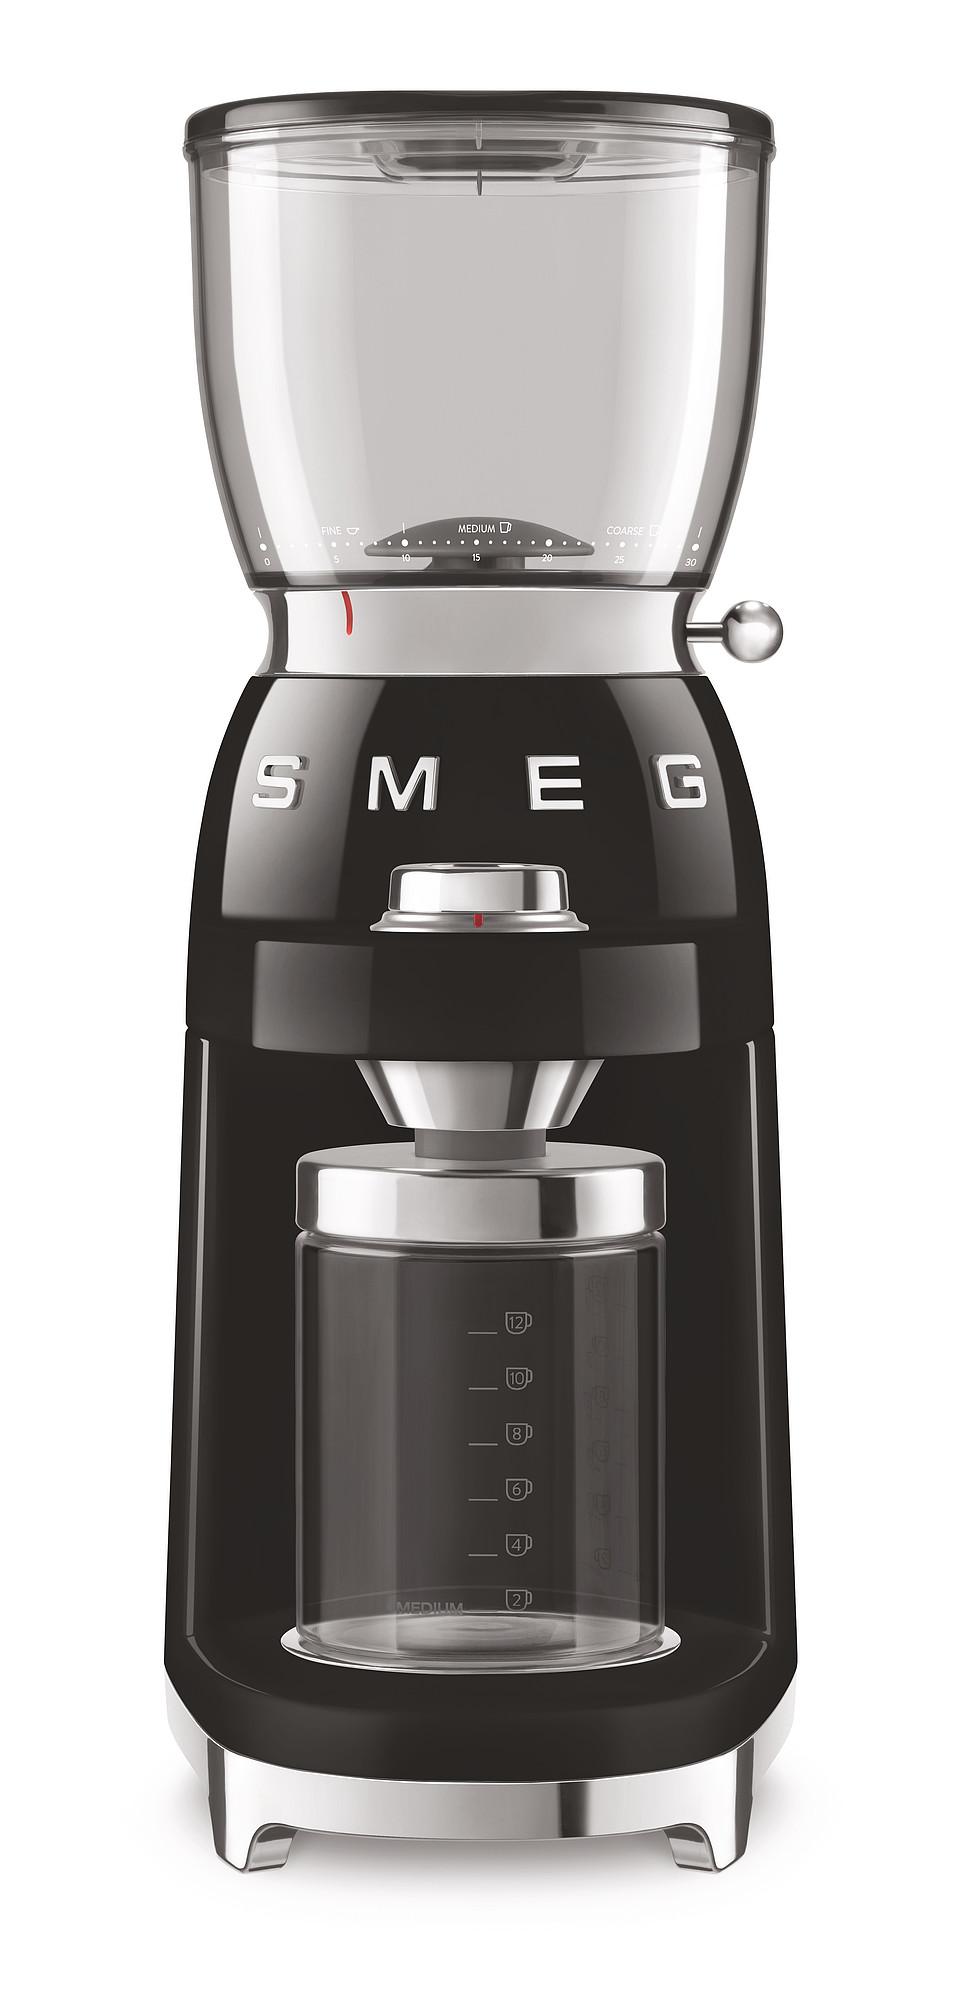 SMEG Kaffeemühle schwarz